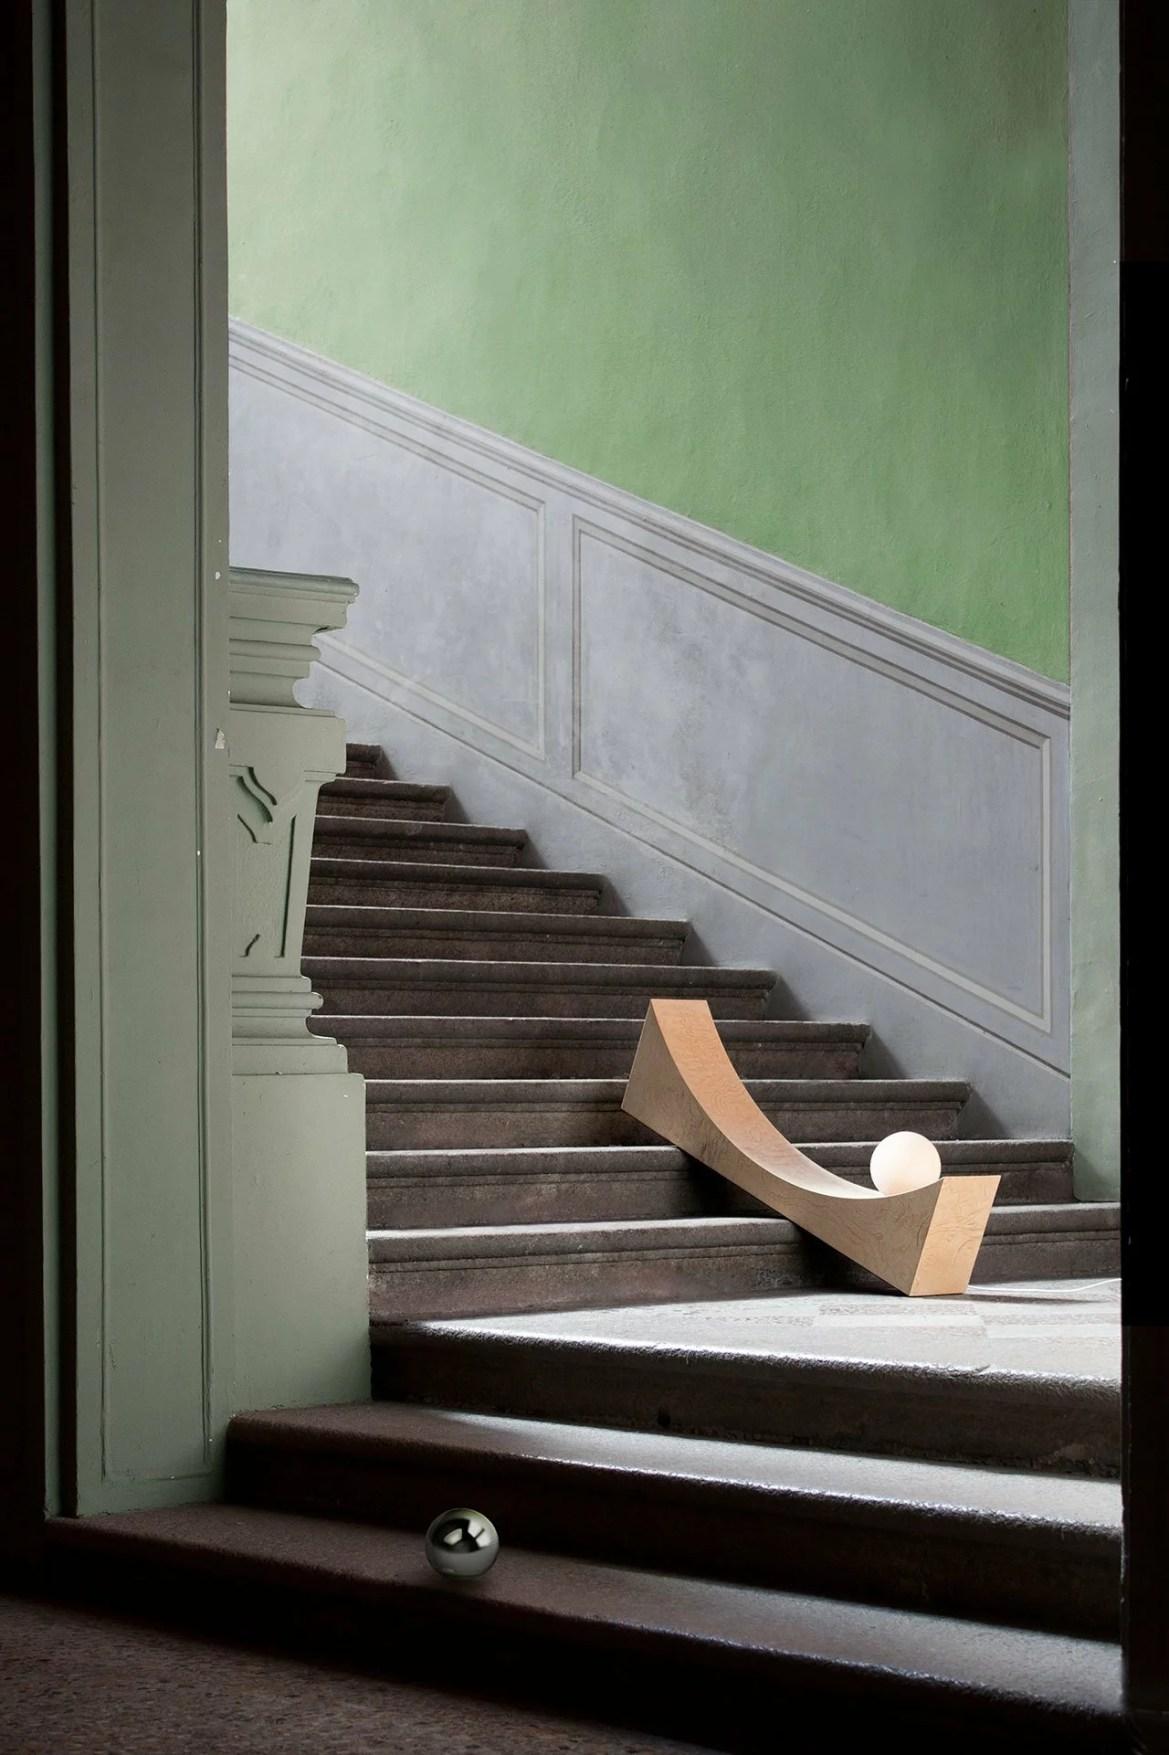 child-studio-in-the-shadow-of-a-man-sculptural-lights-huskdesignblog14